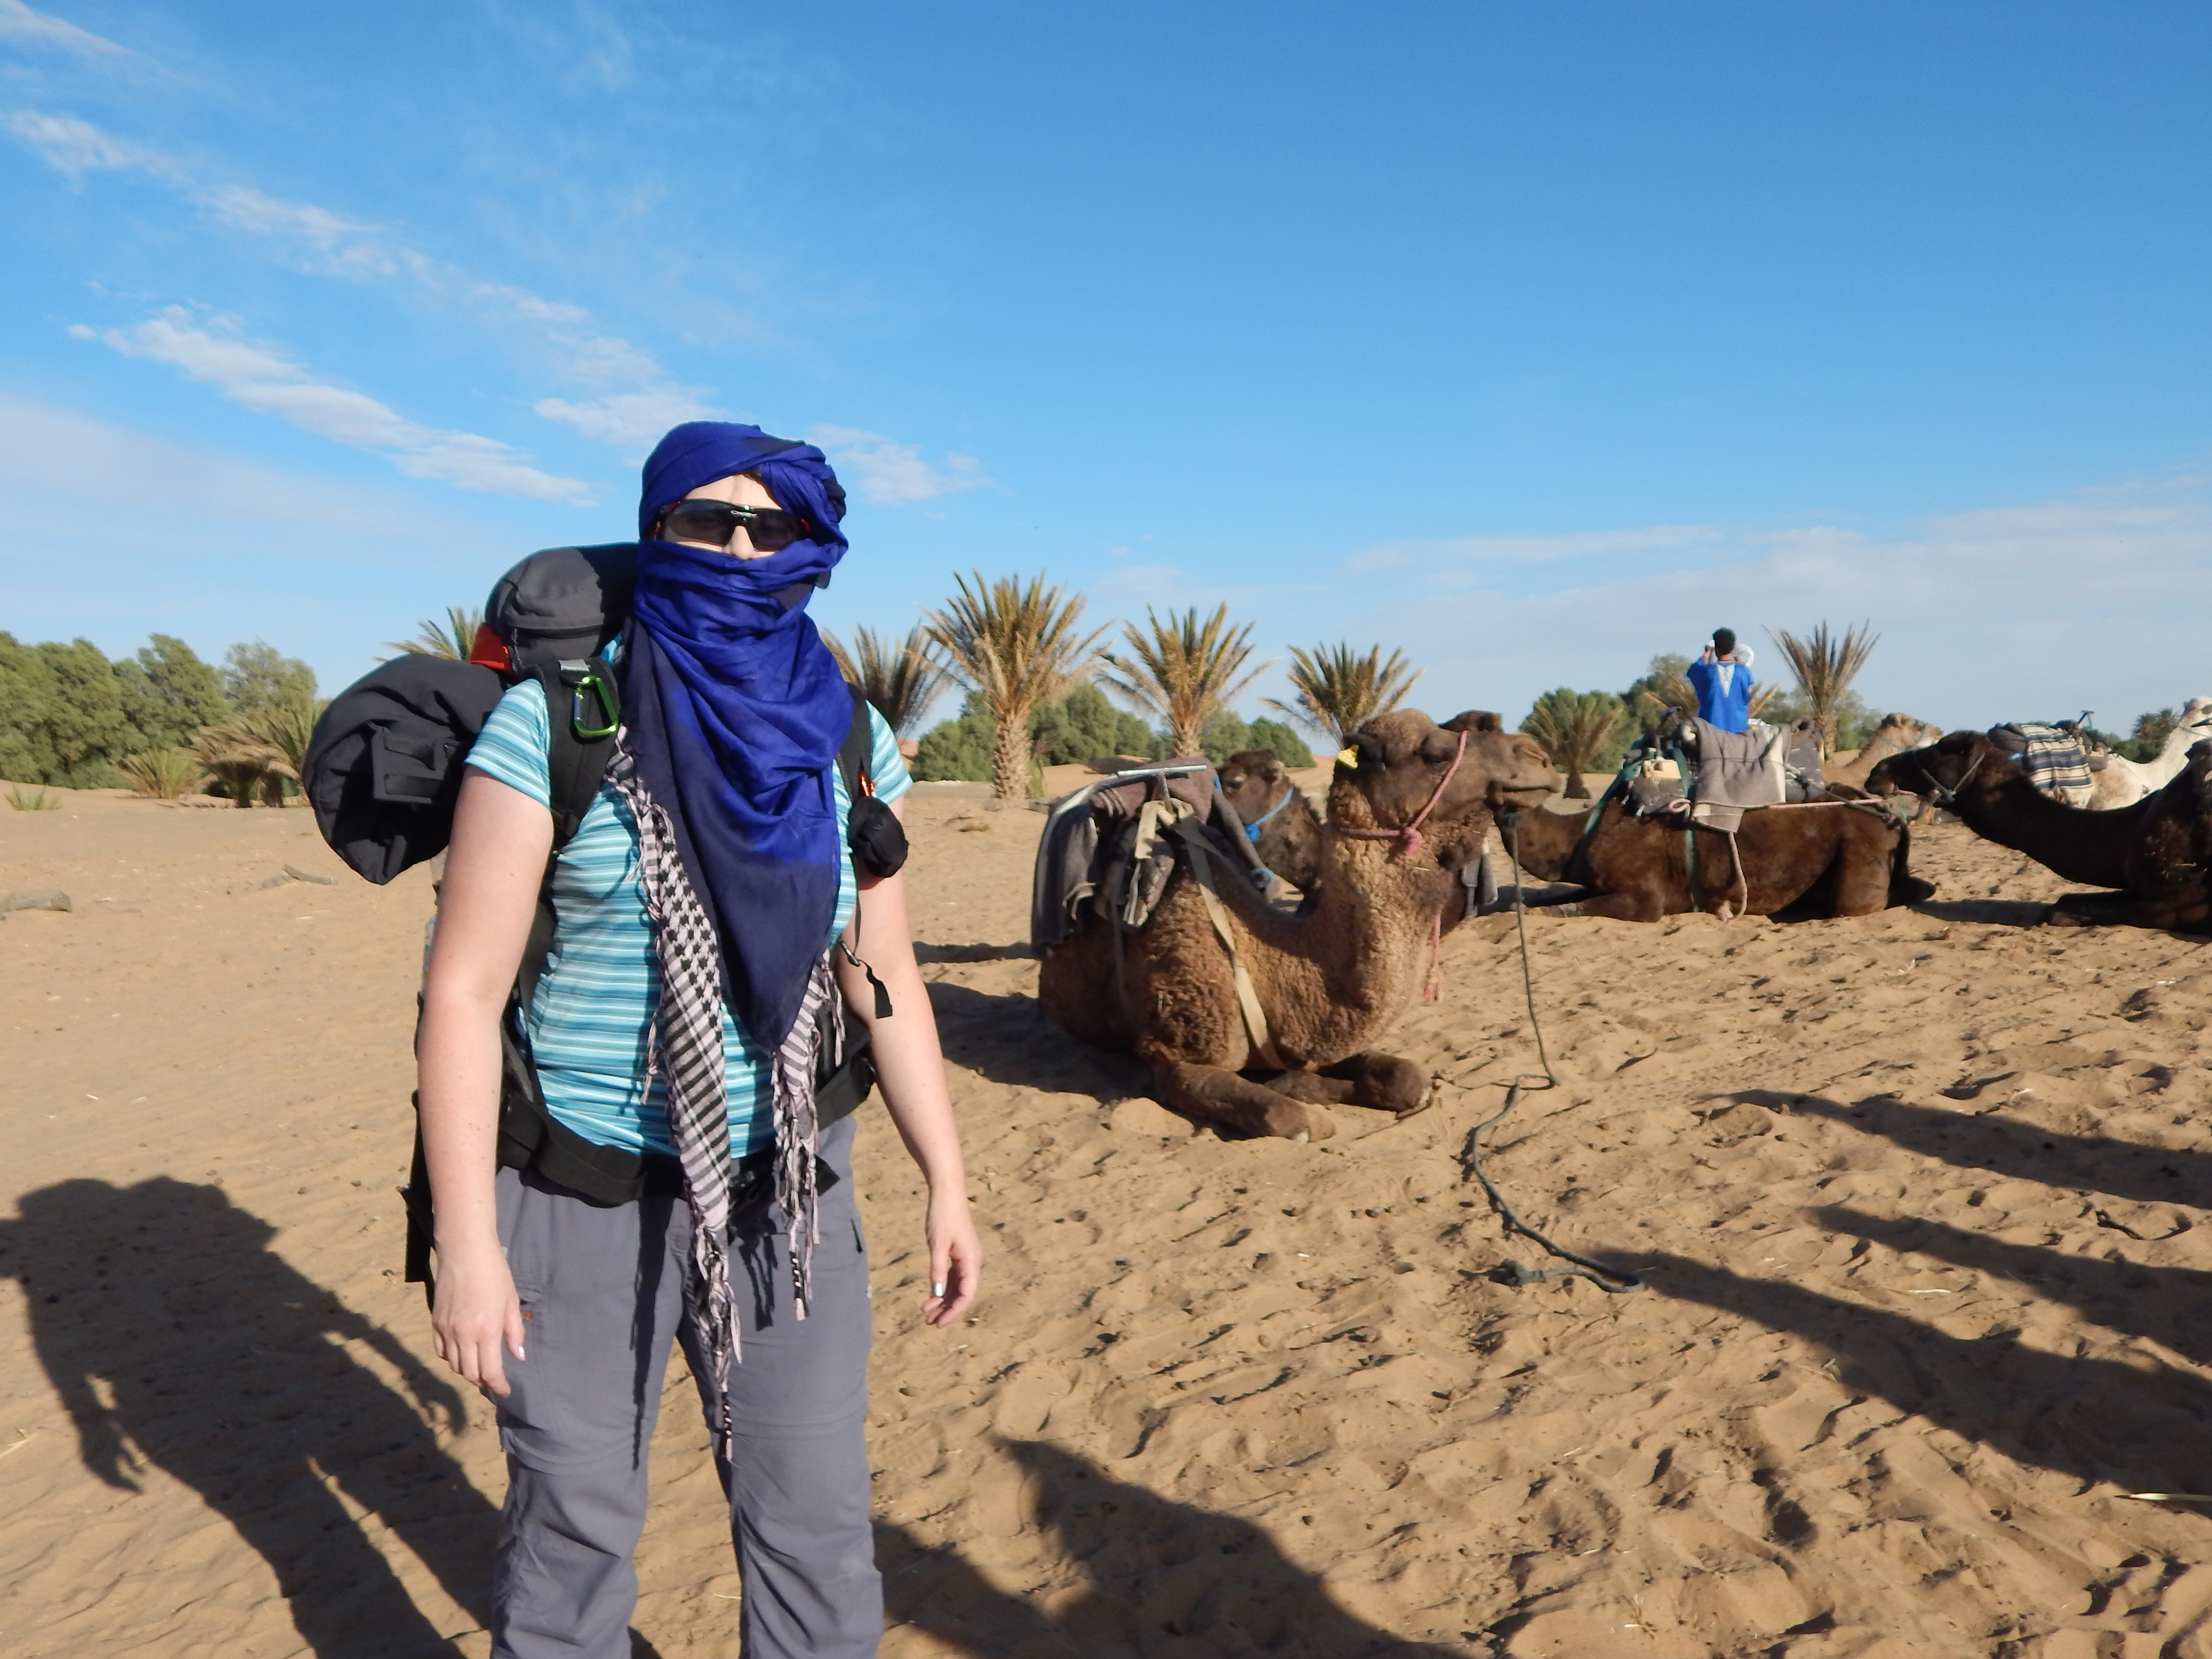 Sahara sivatag